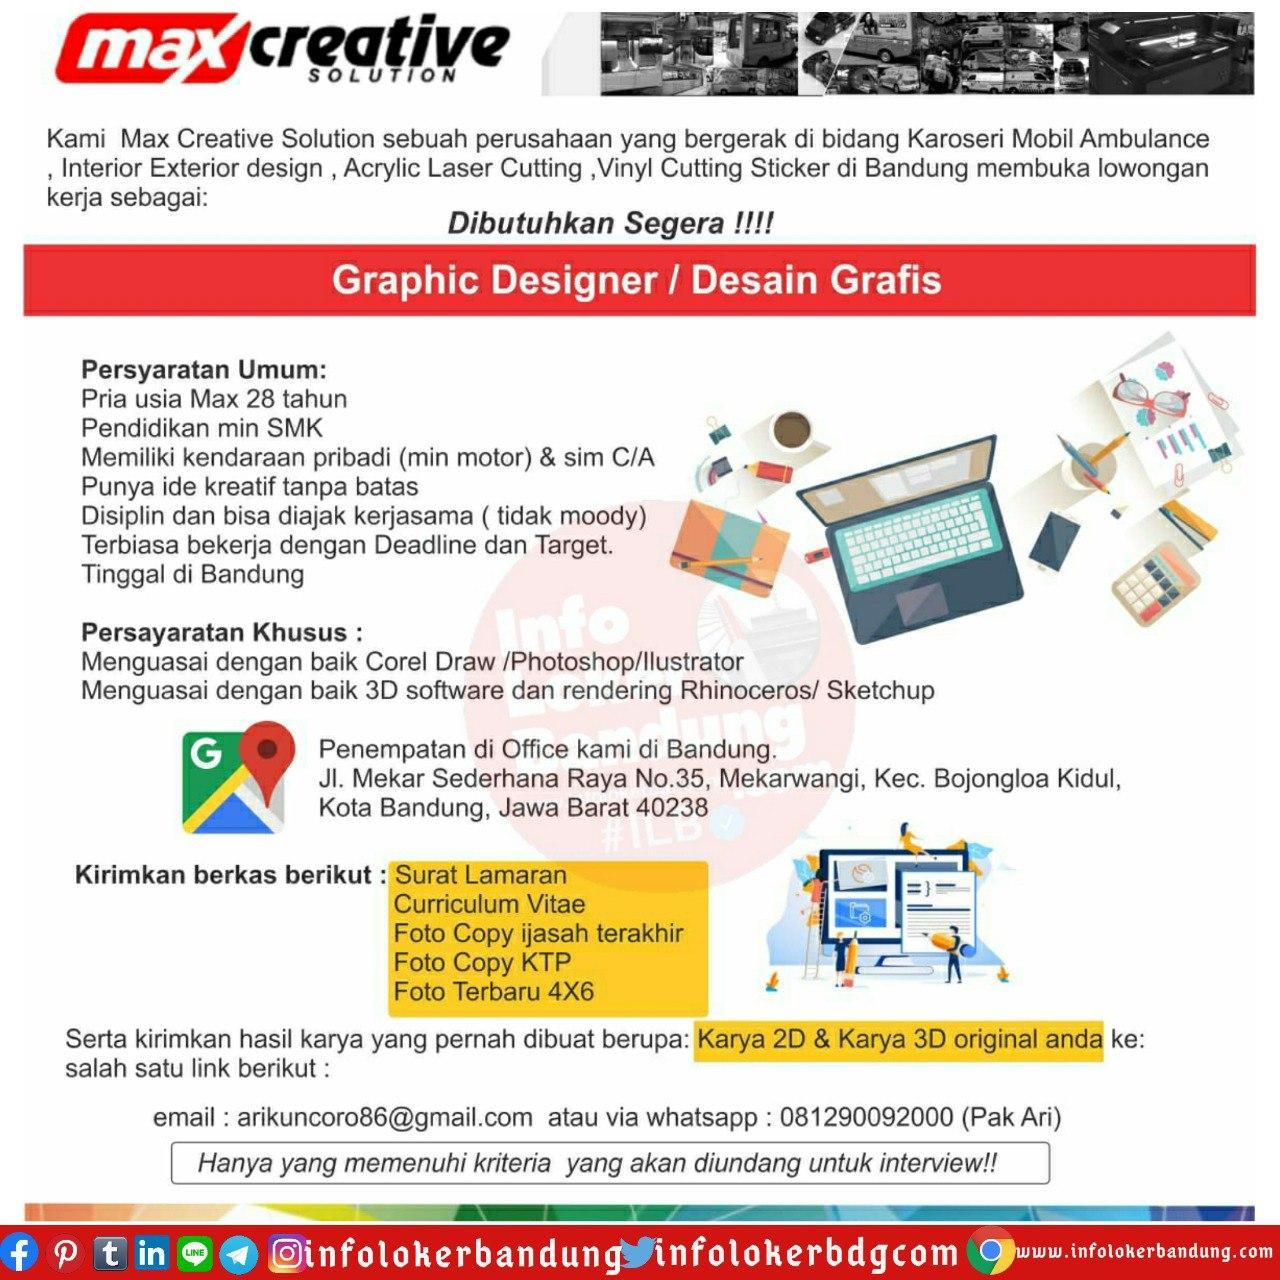 Lowongan Kerja Max Creative Solution Bandung Juli 2020